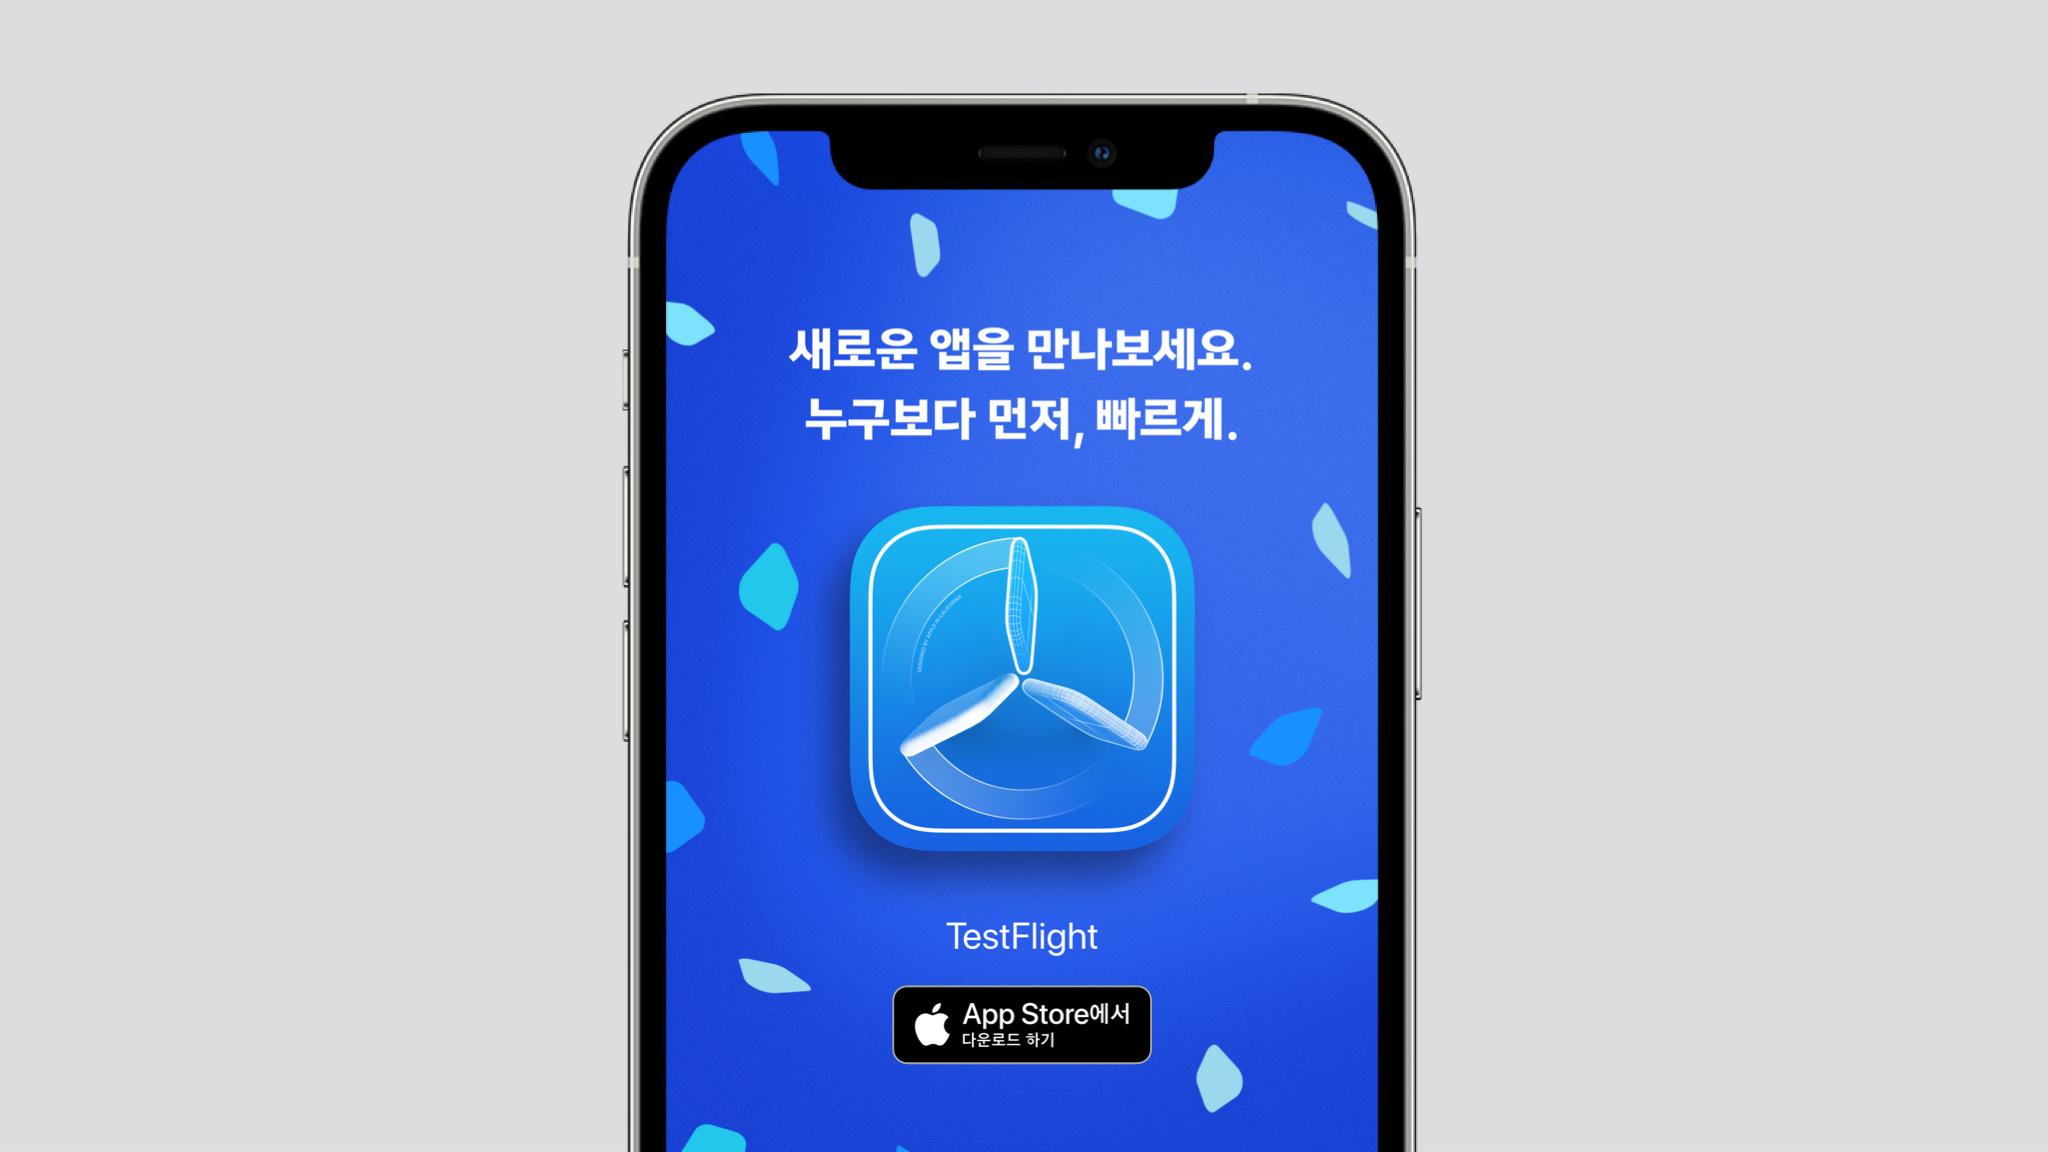 App Store 마케팅 도구로 만든 샘플 마케팅 이미지를 보여주는 iPhone 화면 이미지